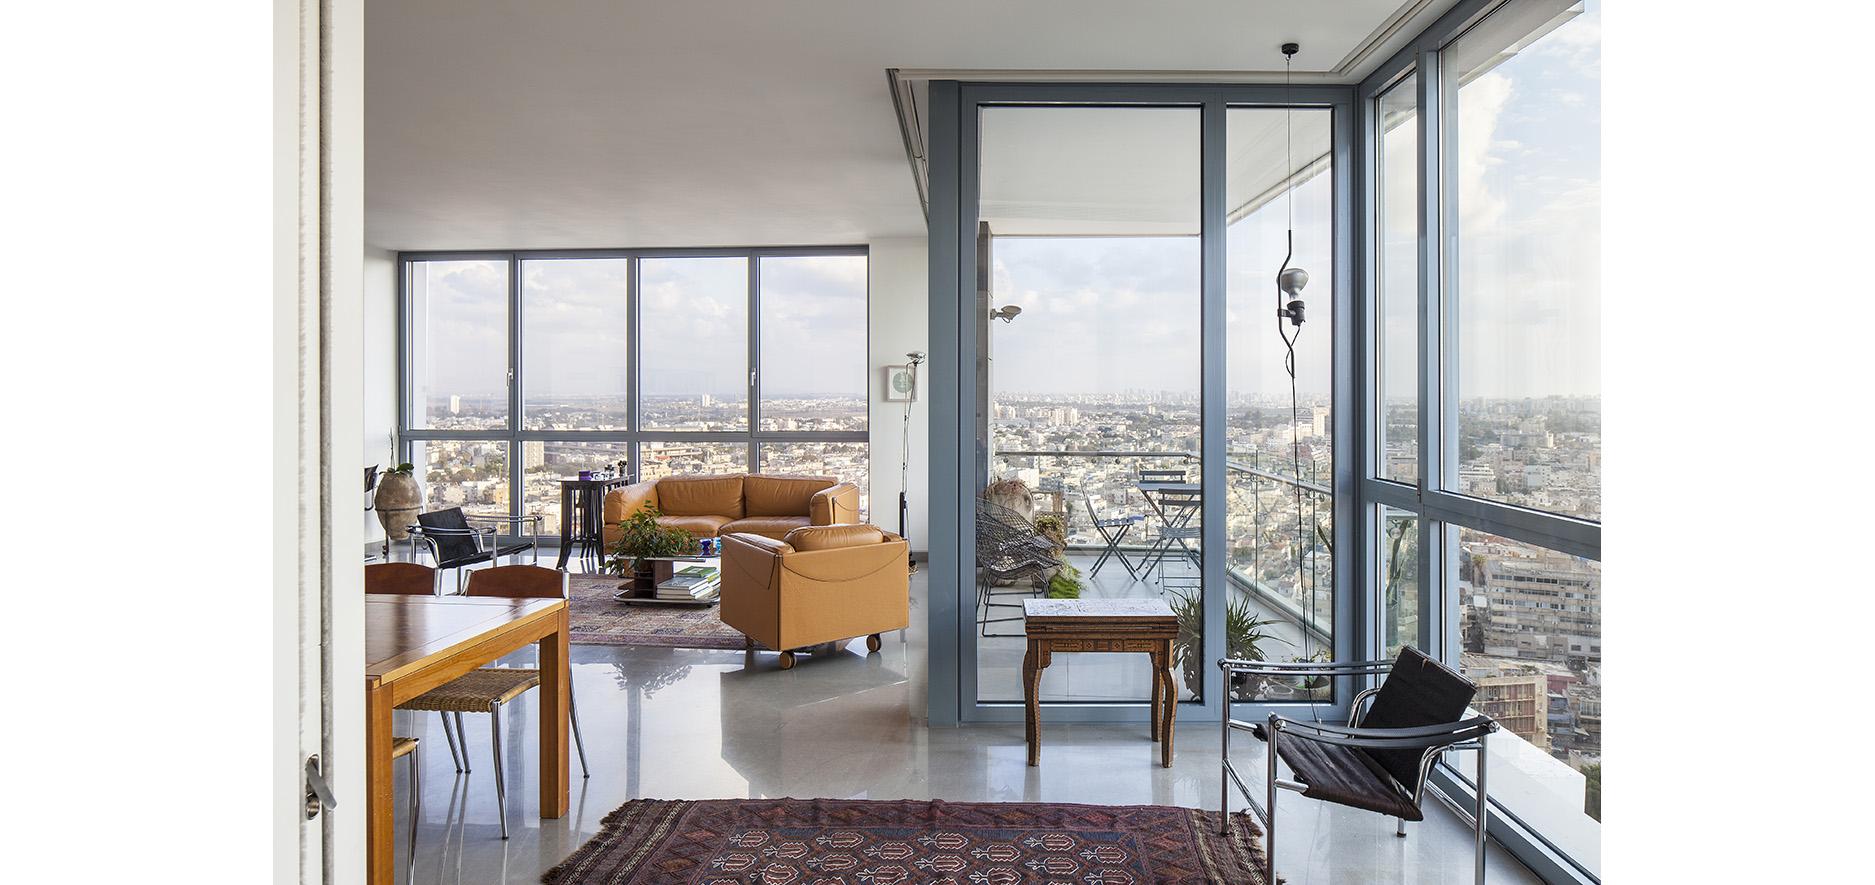 Rothschild_30_Tower_Tel_Aviv_planned_By_Kolker_Epstein_Architects10